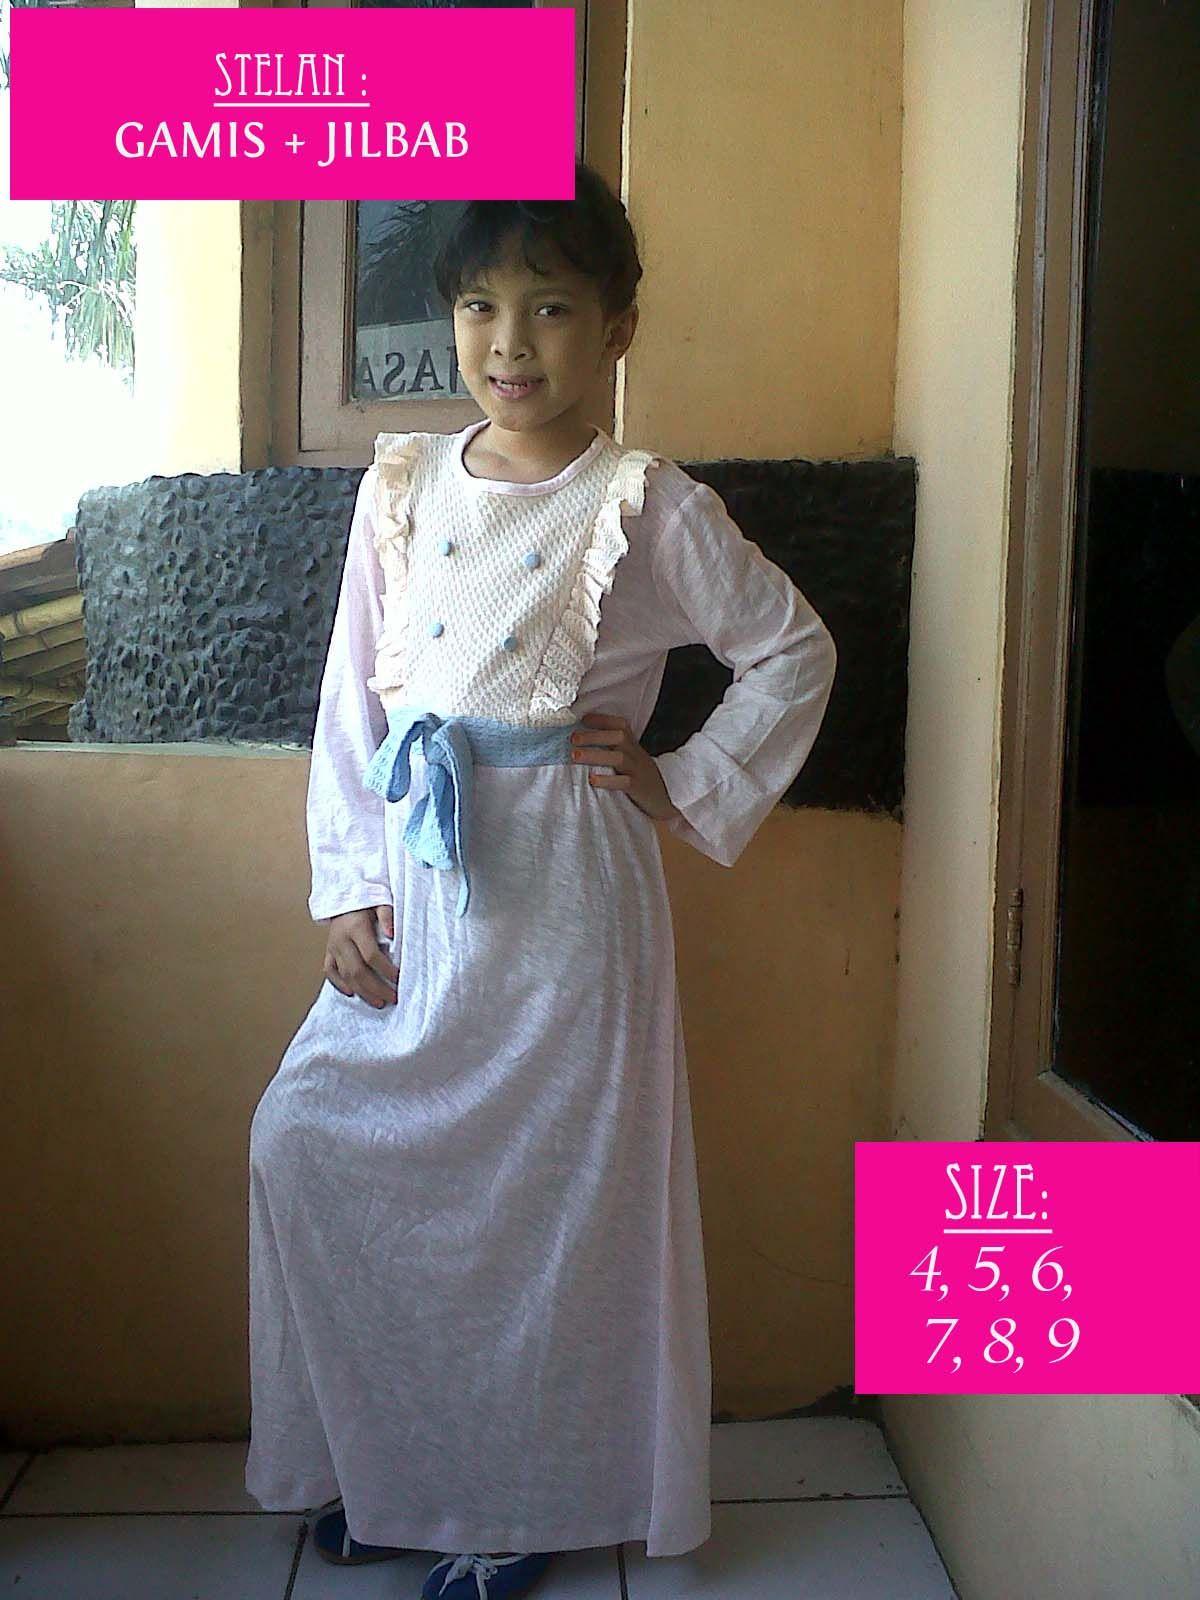 Baju Gamis Kaos Anak GRATIS JILBAB KEREN Size 4 5 6 7 8